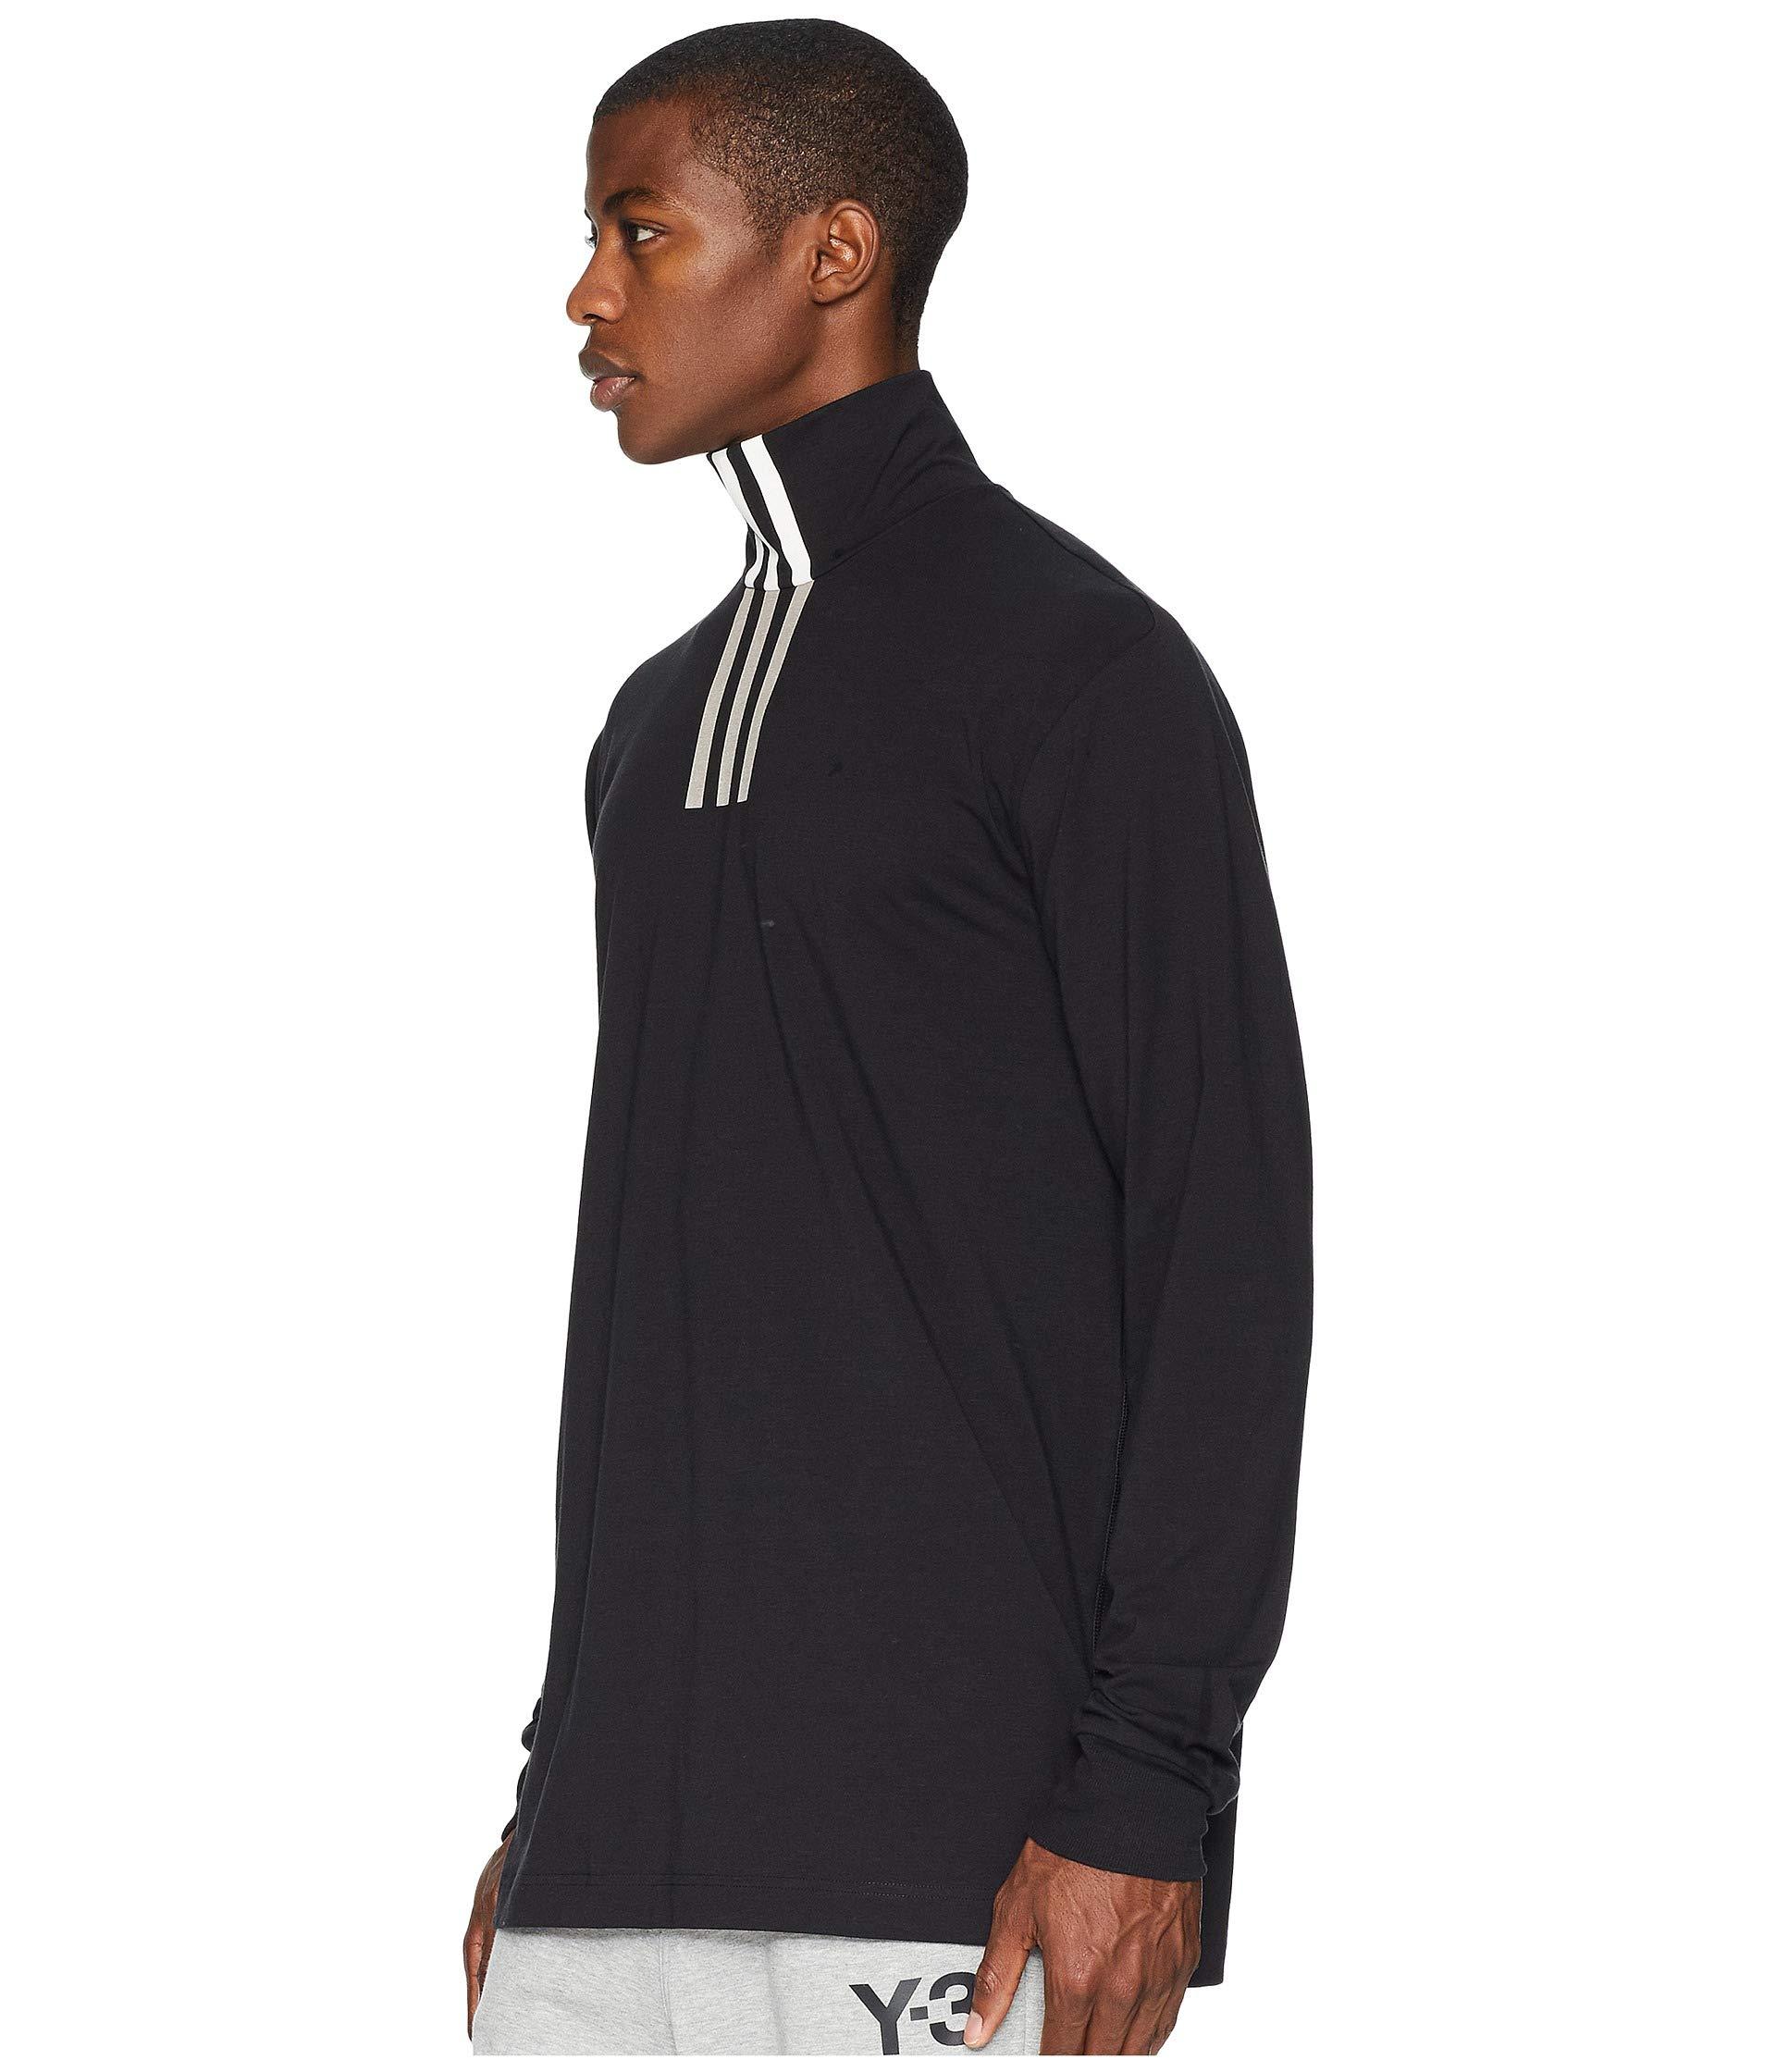 White 3 Black Adidas Sleeve Tee Unisex Stripe Neck Y 3 Yamamoto Long core Yohji High By XqHXZrO